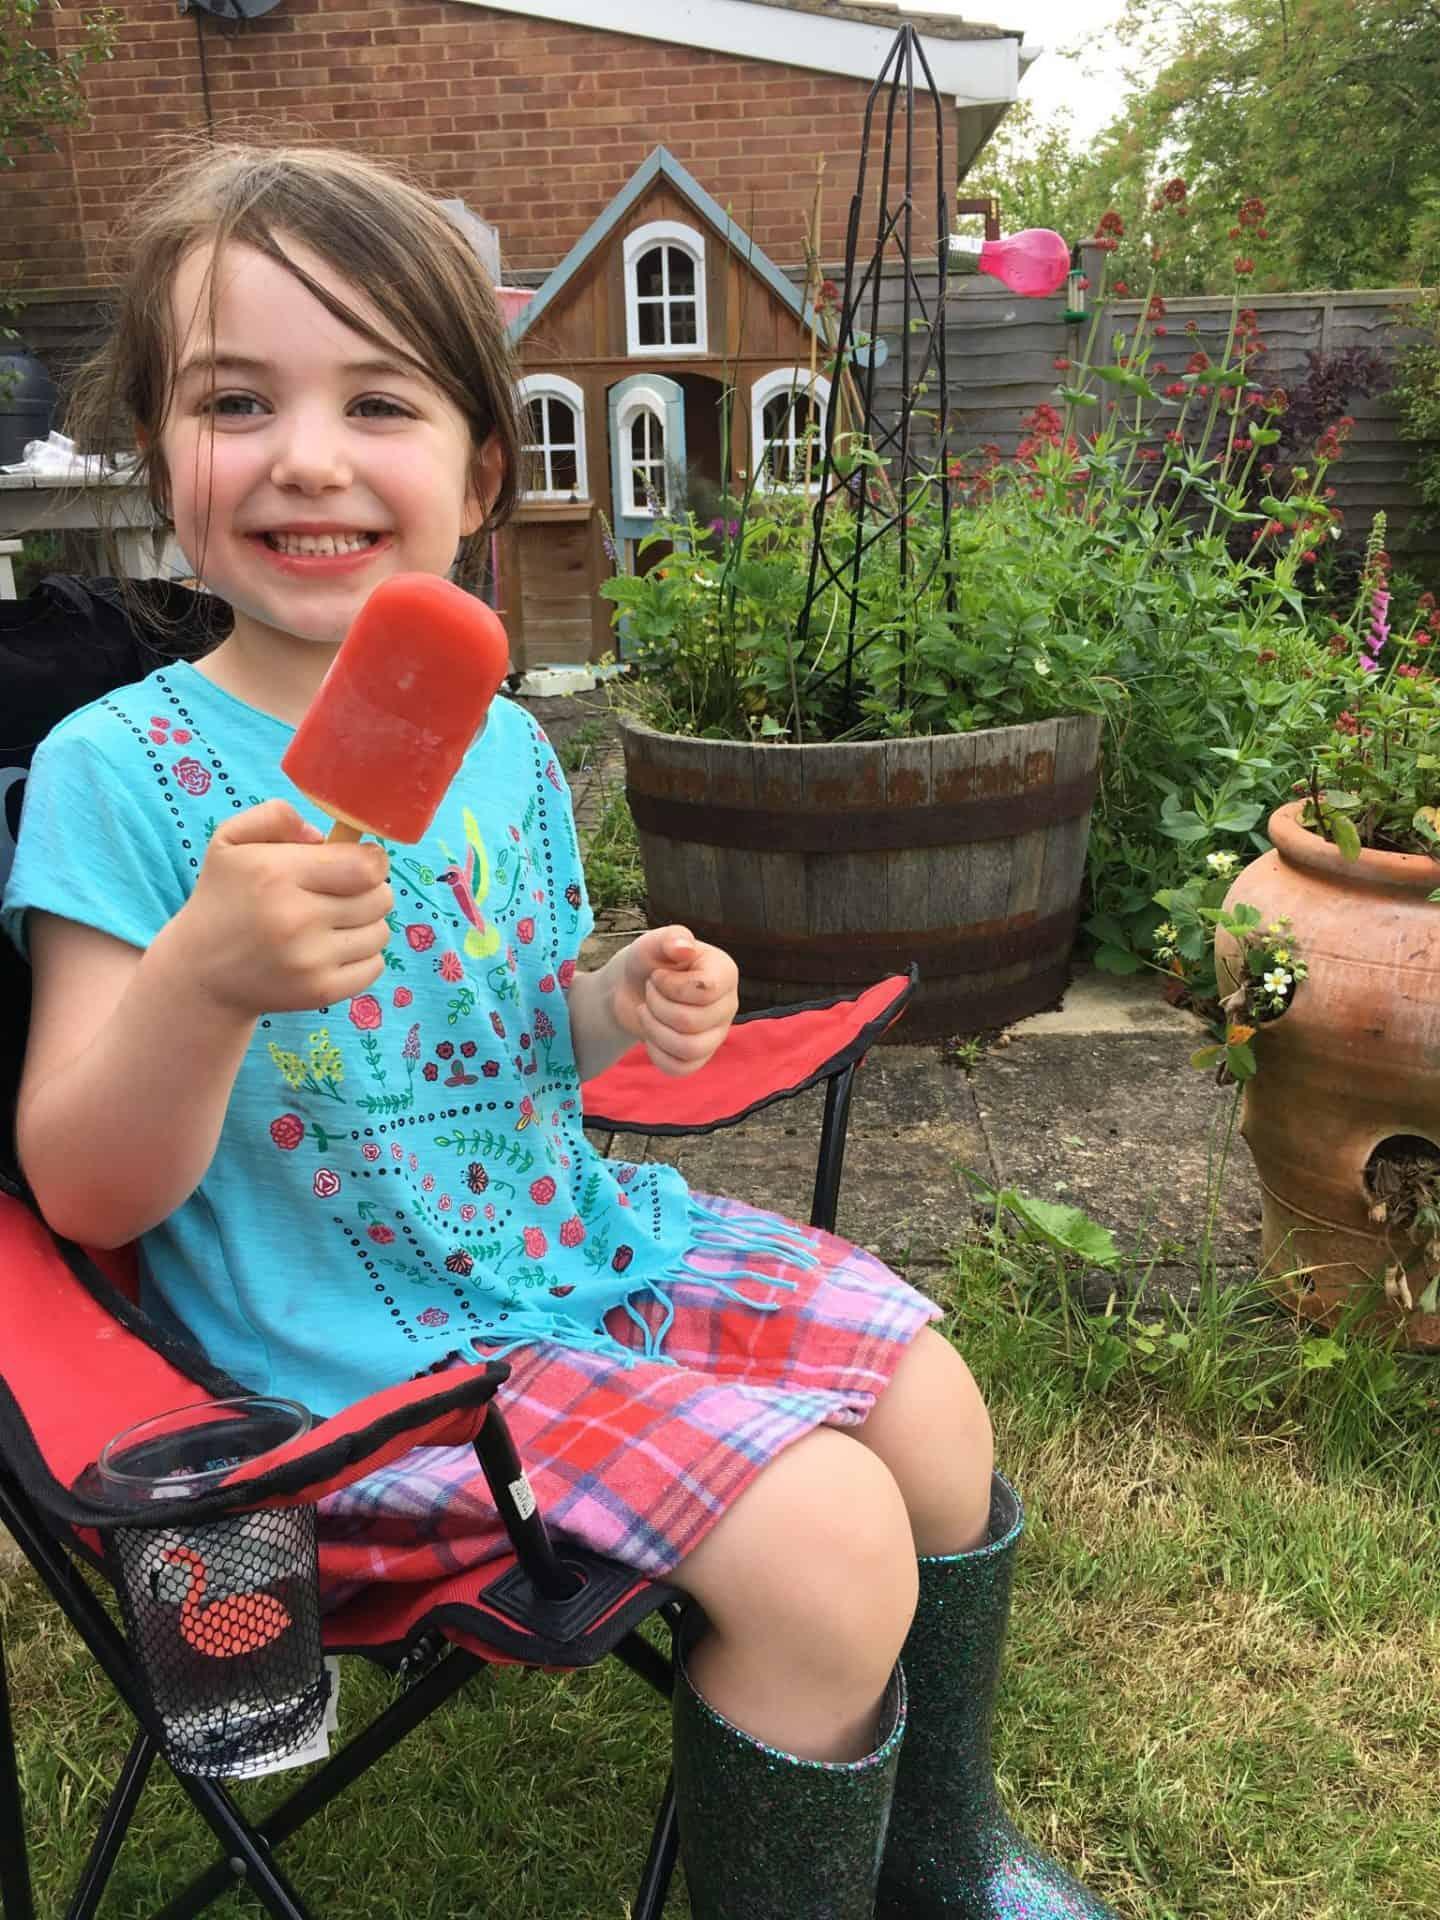 Enjoying a treat after all her hard work gardening